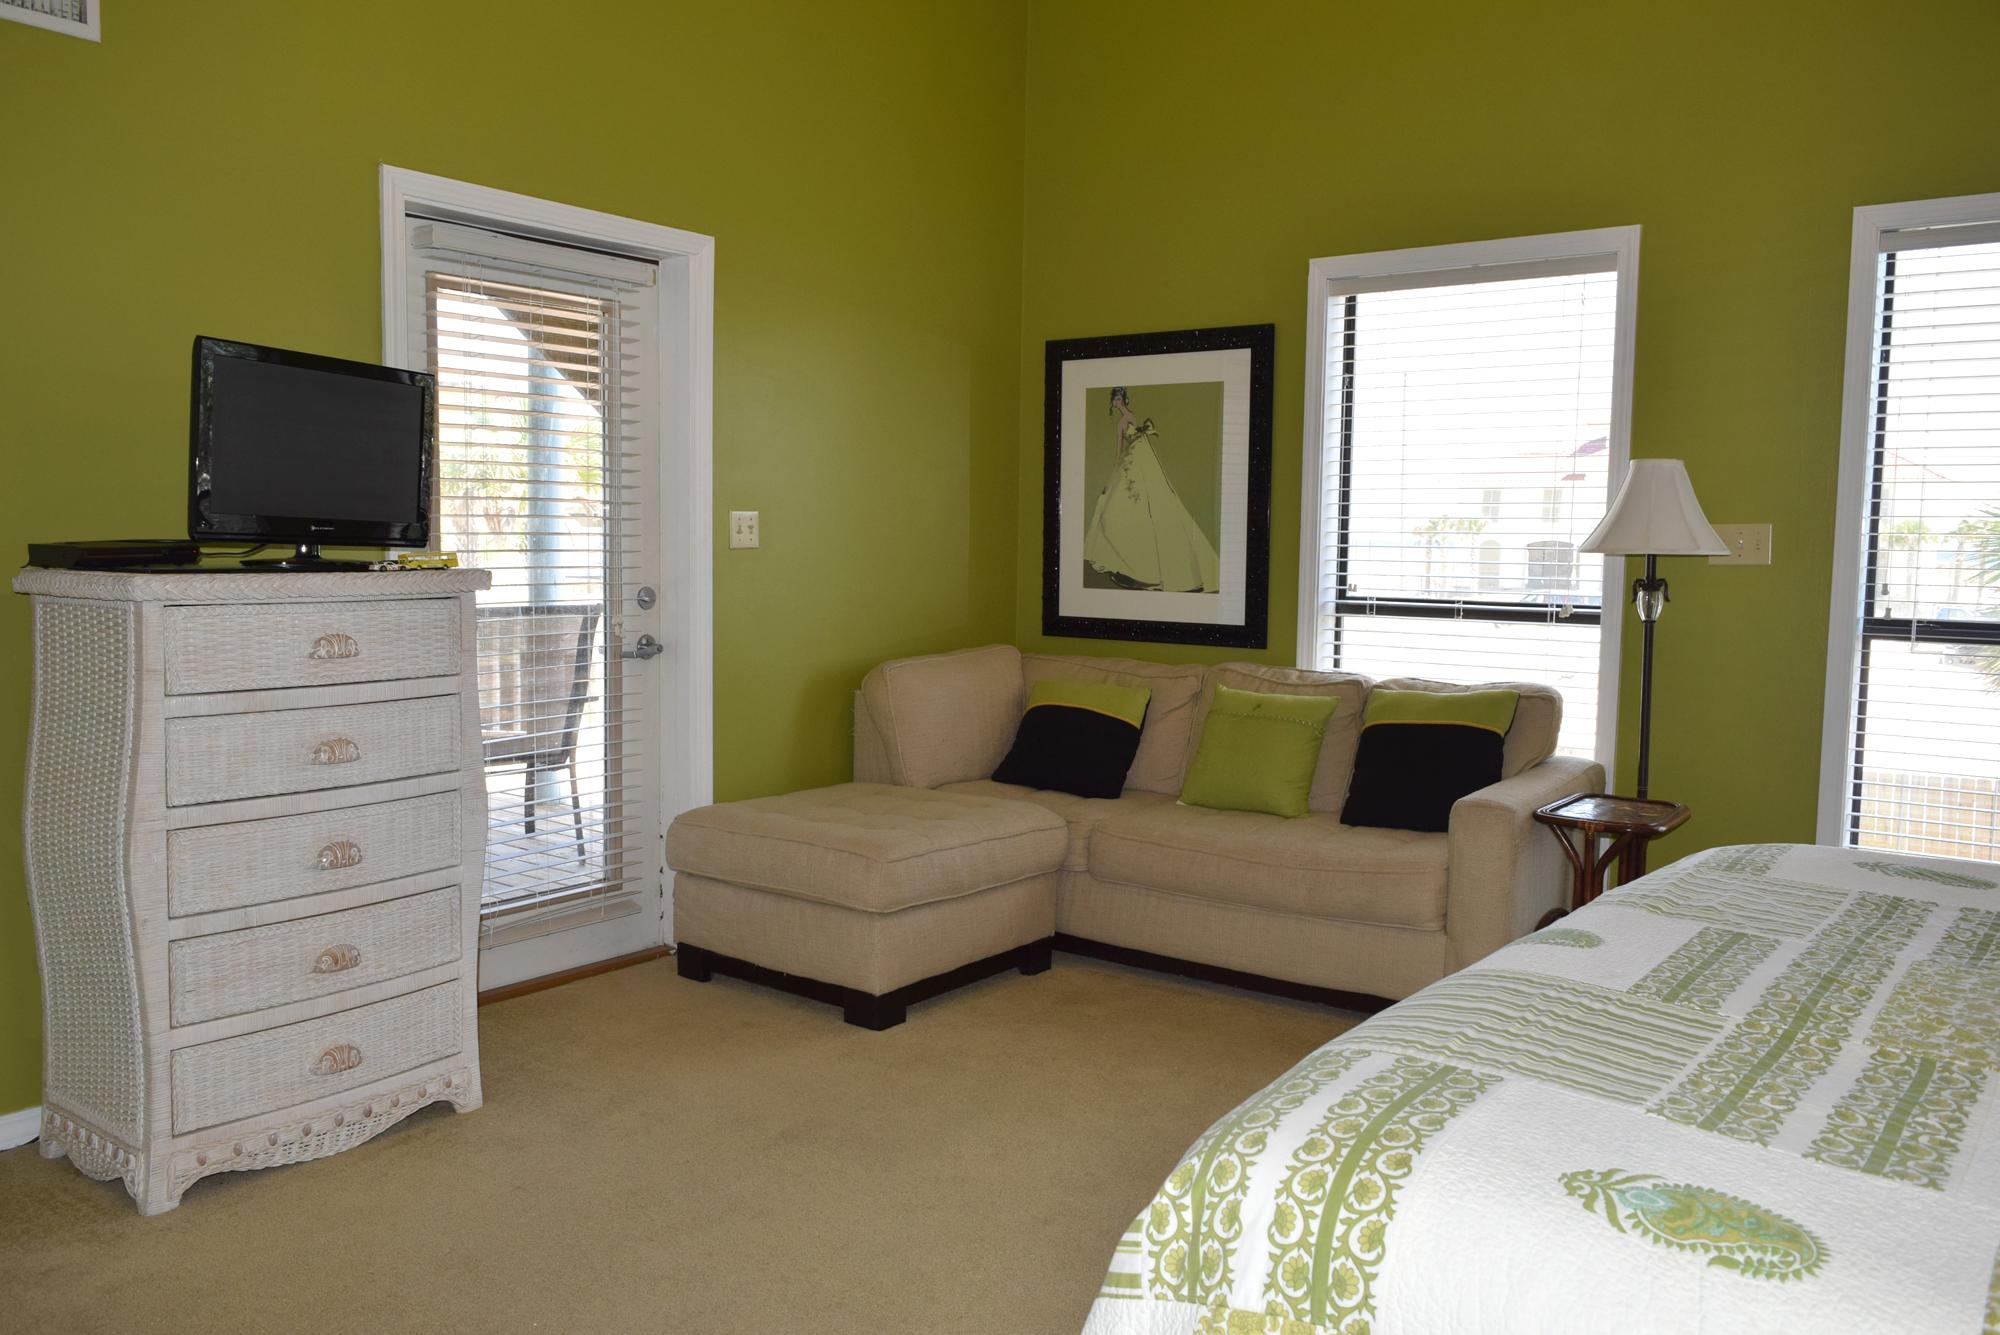 Maldonado 1010 House/Cottage rental in Pensacola Beach House Rentals in Pensacola Beach Florida - #25